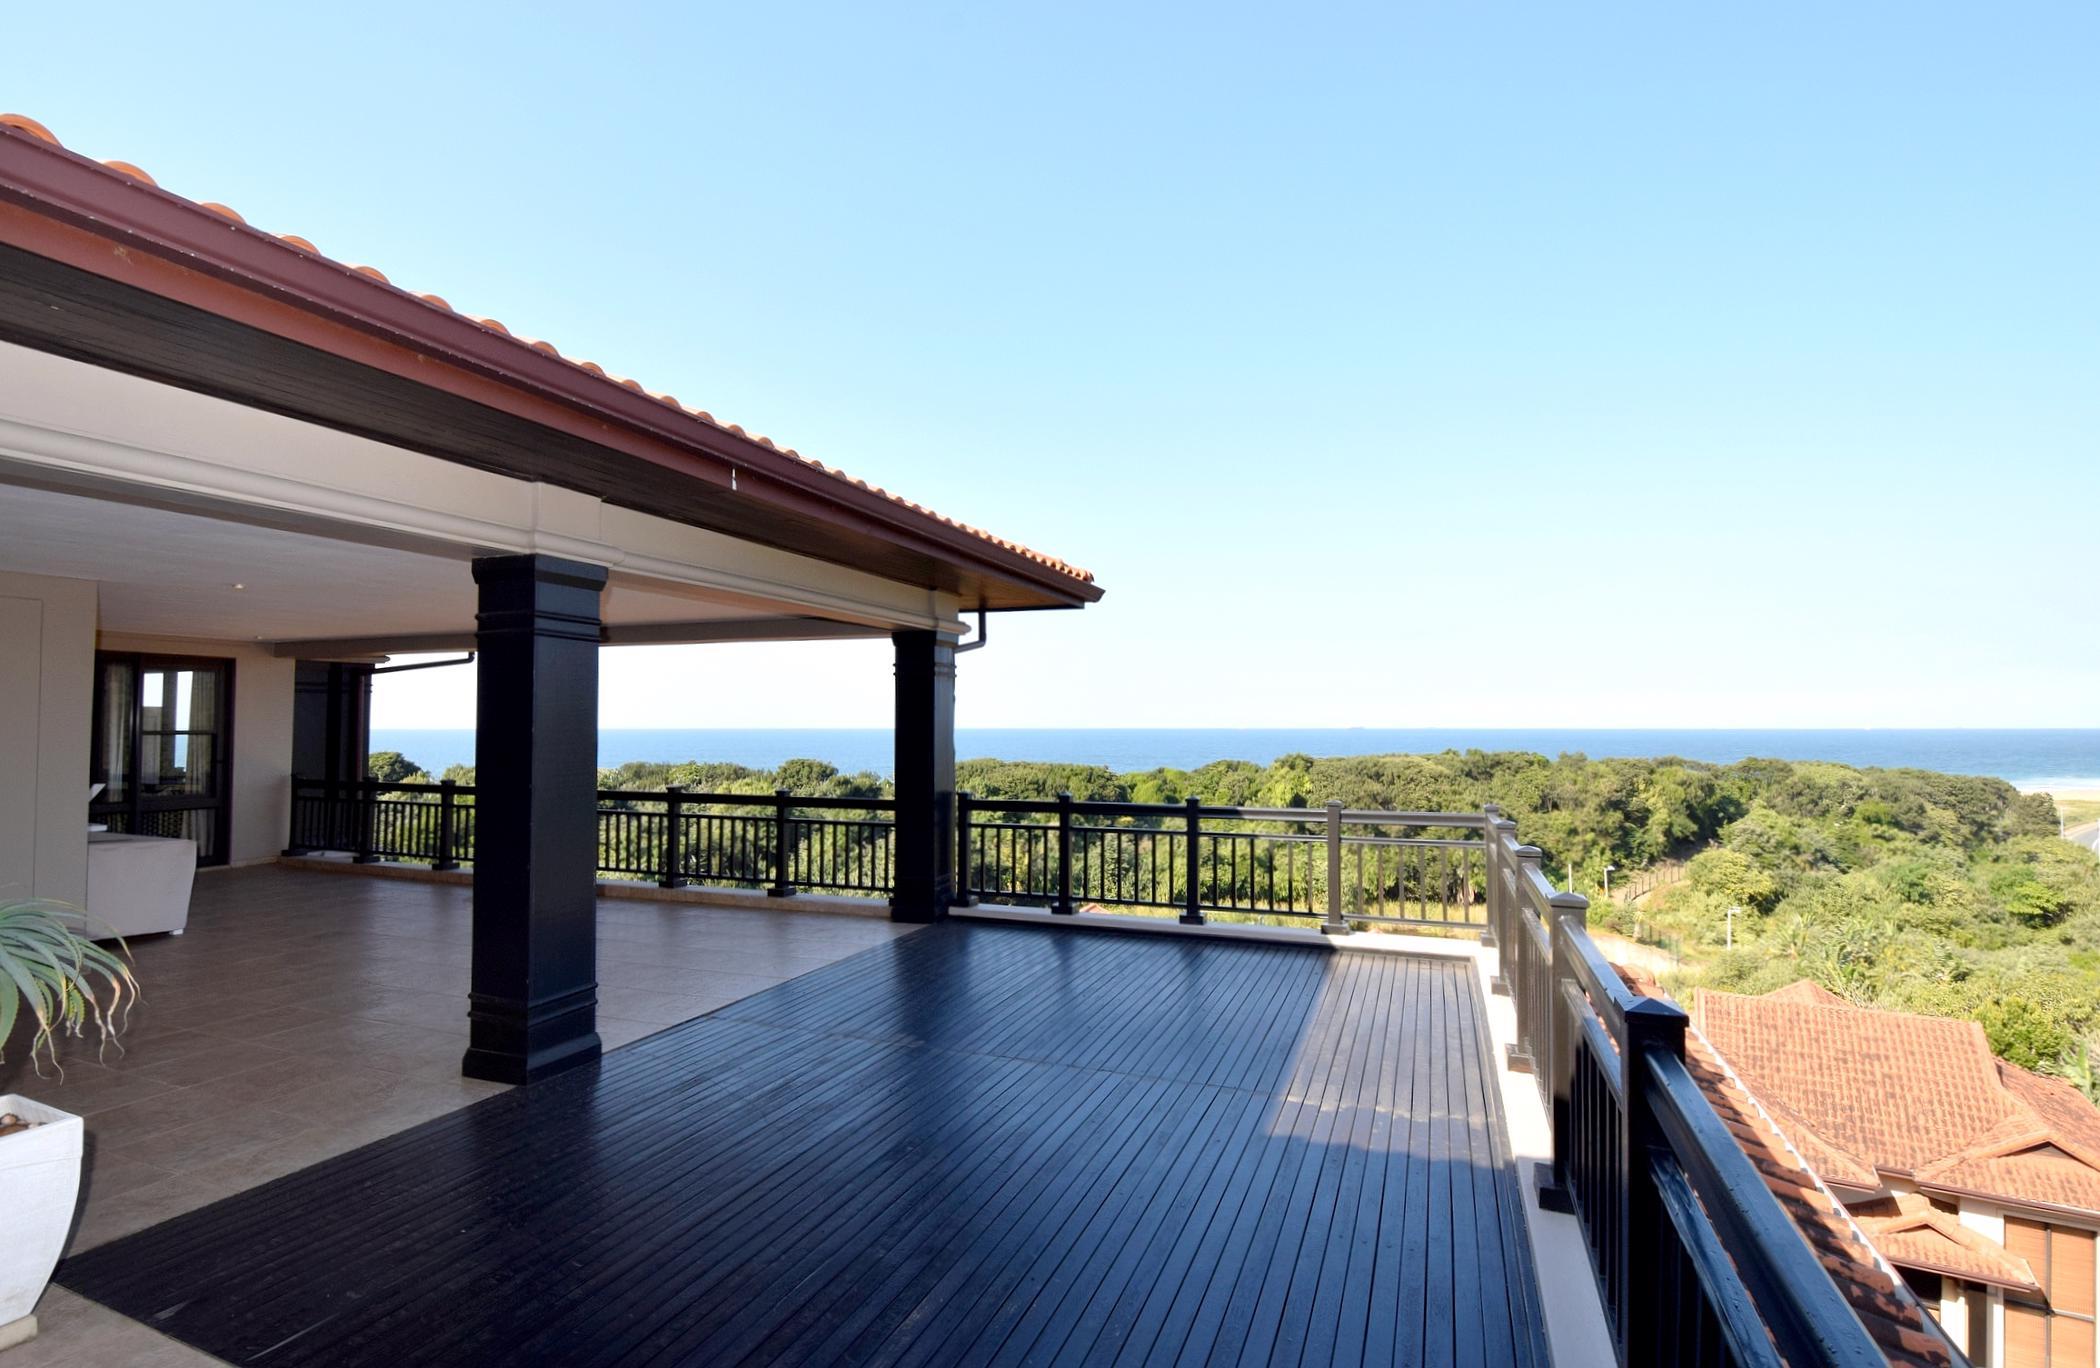 4 bedroom penthouse apartment for sale in Zimbali Coastal Resort